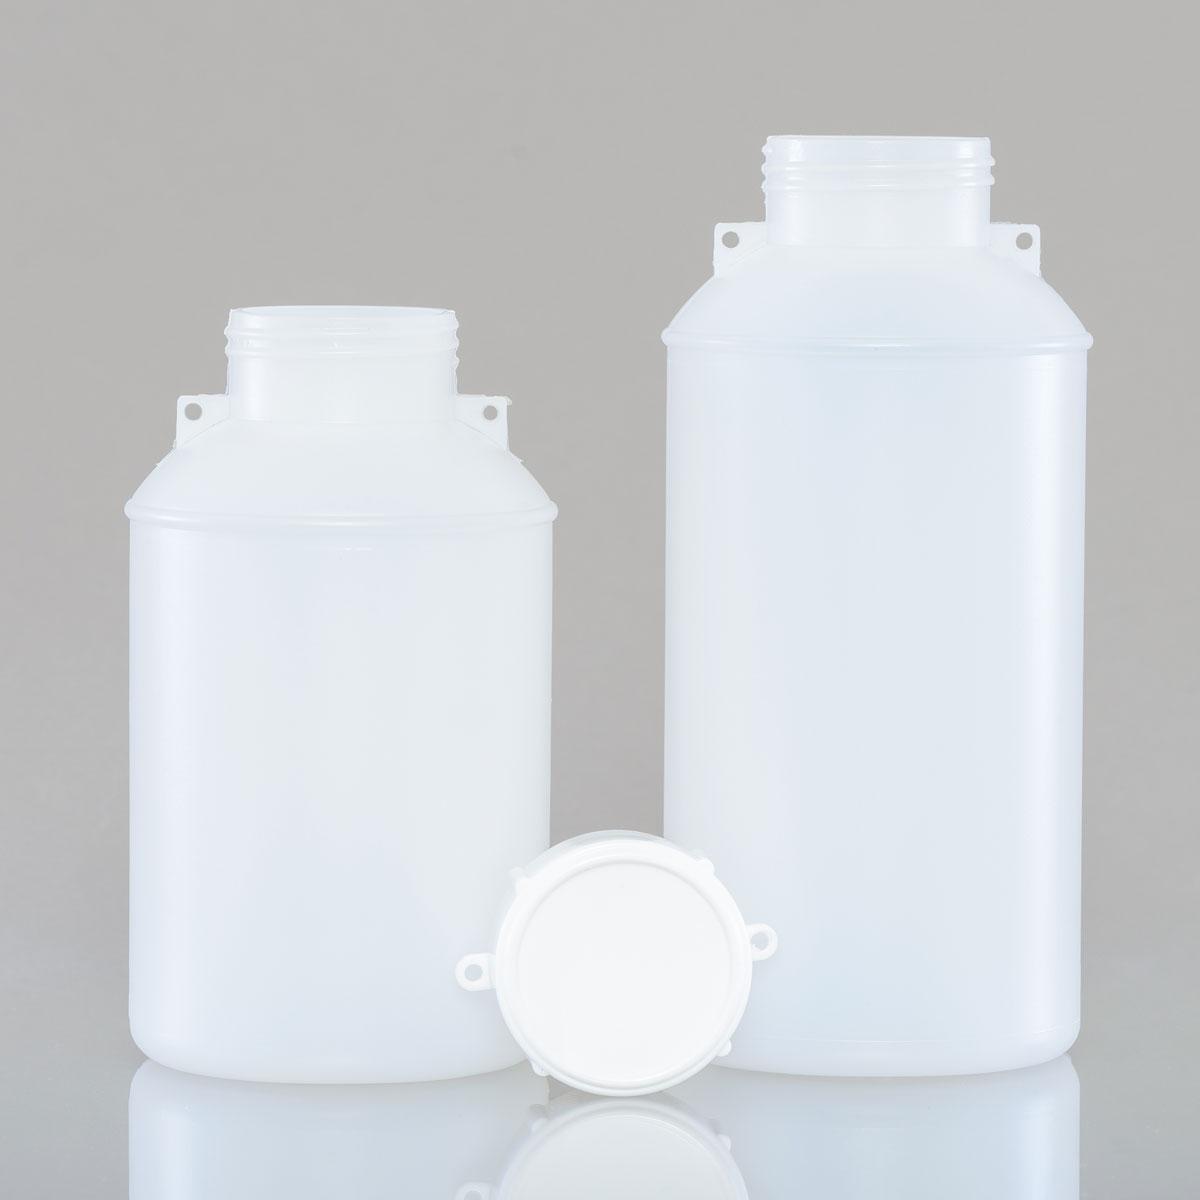 http://fuelsamplebottles.com/wp-content/uploads/gulsby-packaging-041-1200x.jpg